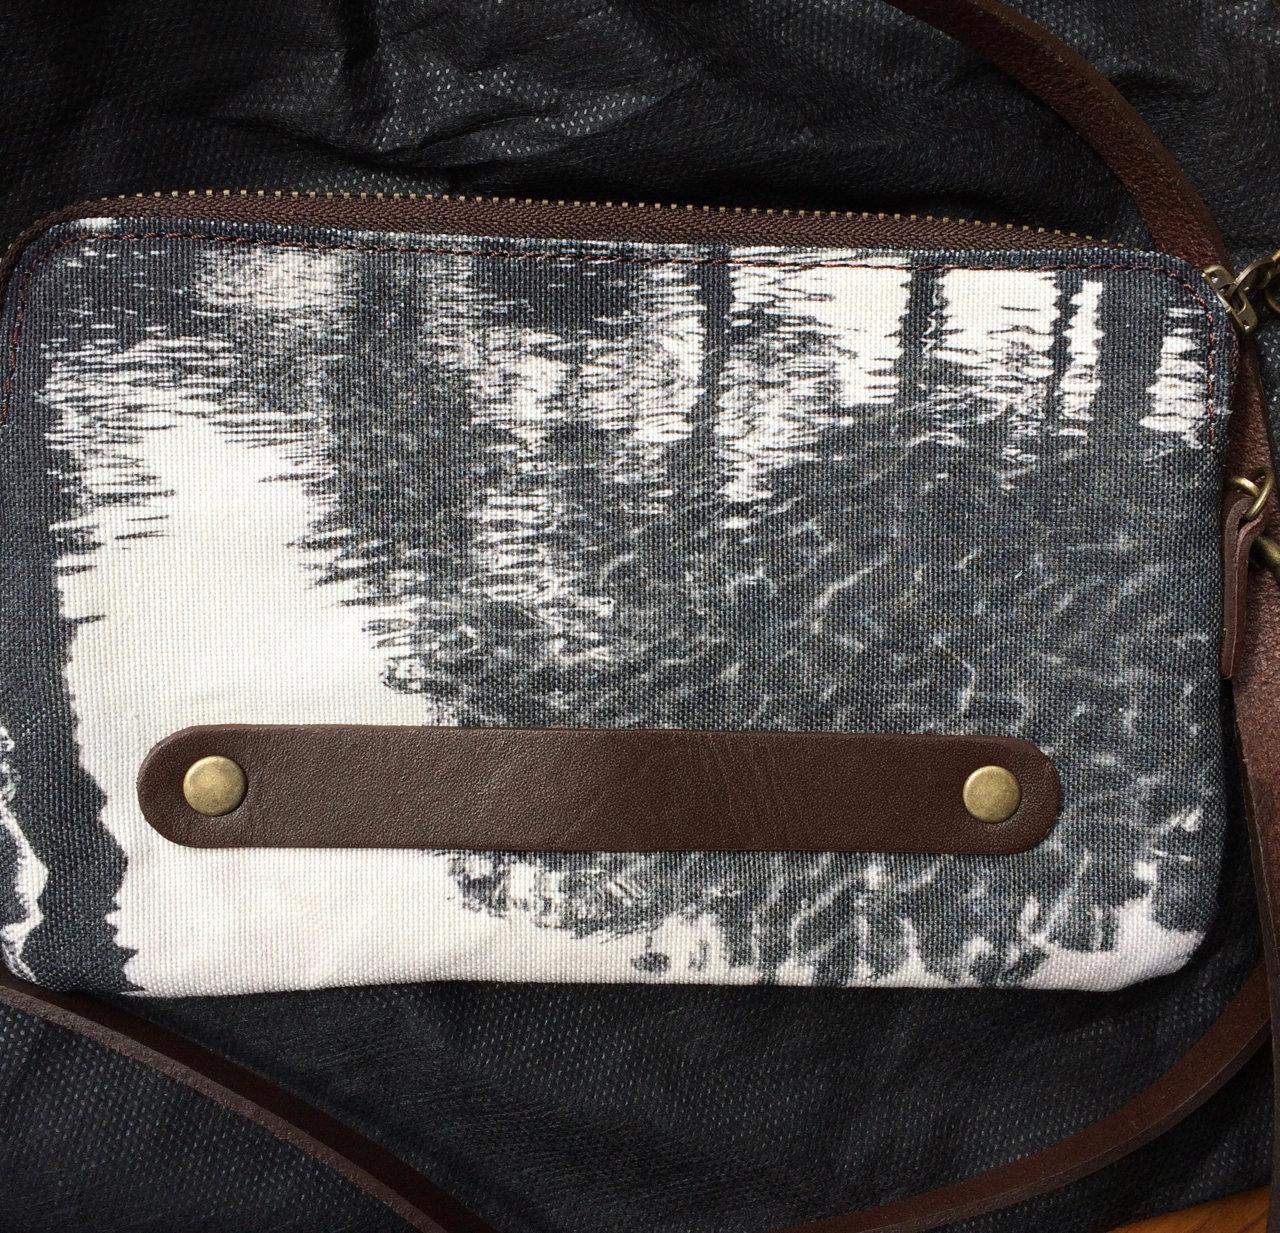 Charcoal - designer clutch bag back view.